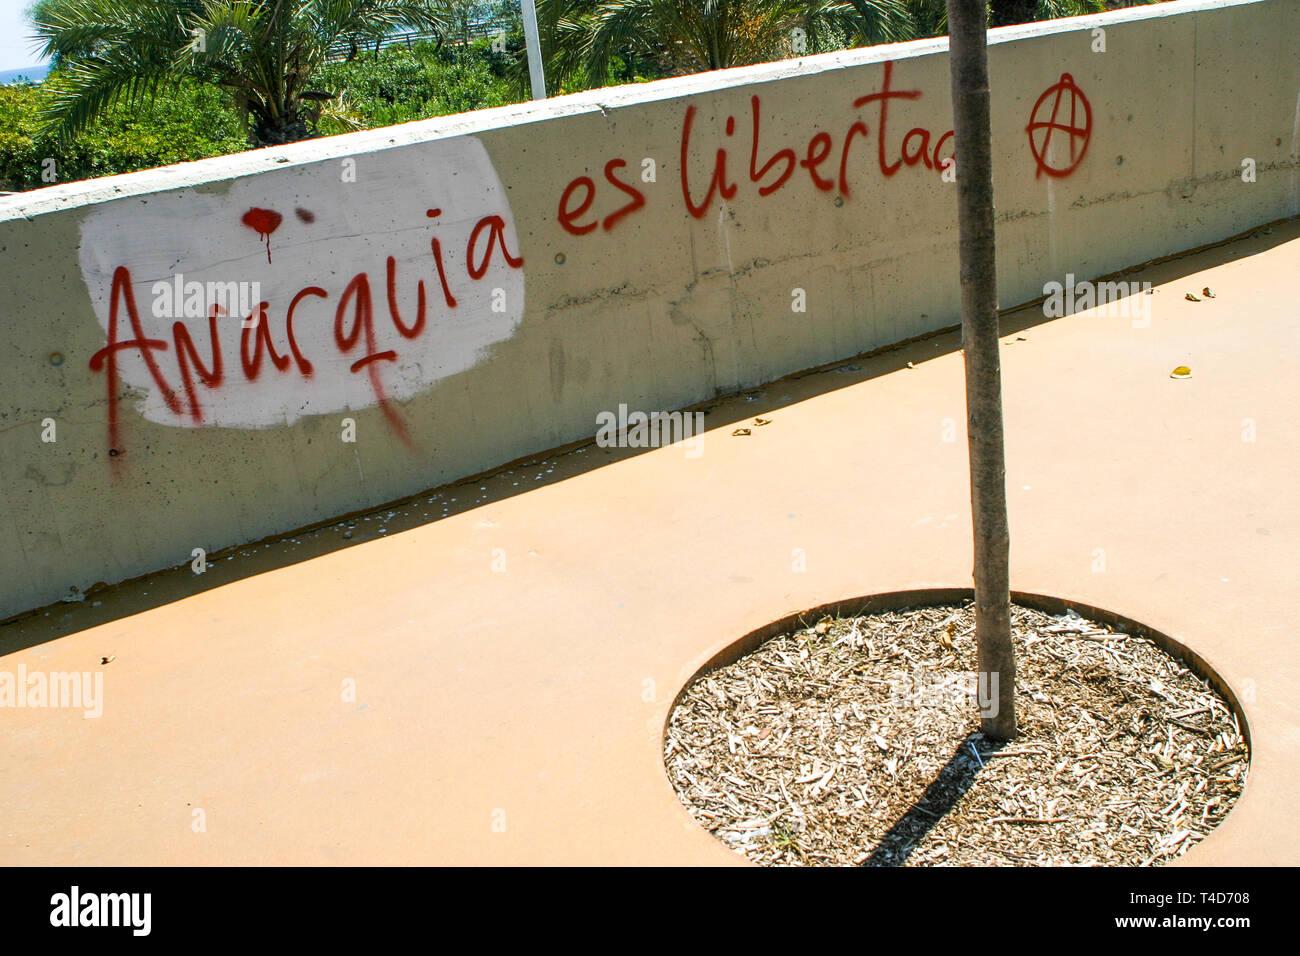 Graffiti Reading Anarchy Is Liberty Park Forum District Barcelona Catalonia Spain Stock Photo Alamy